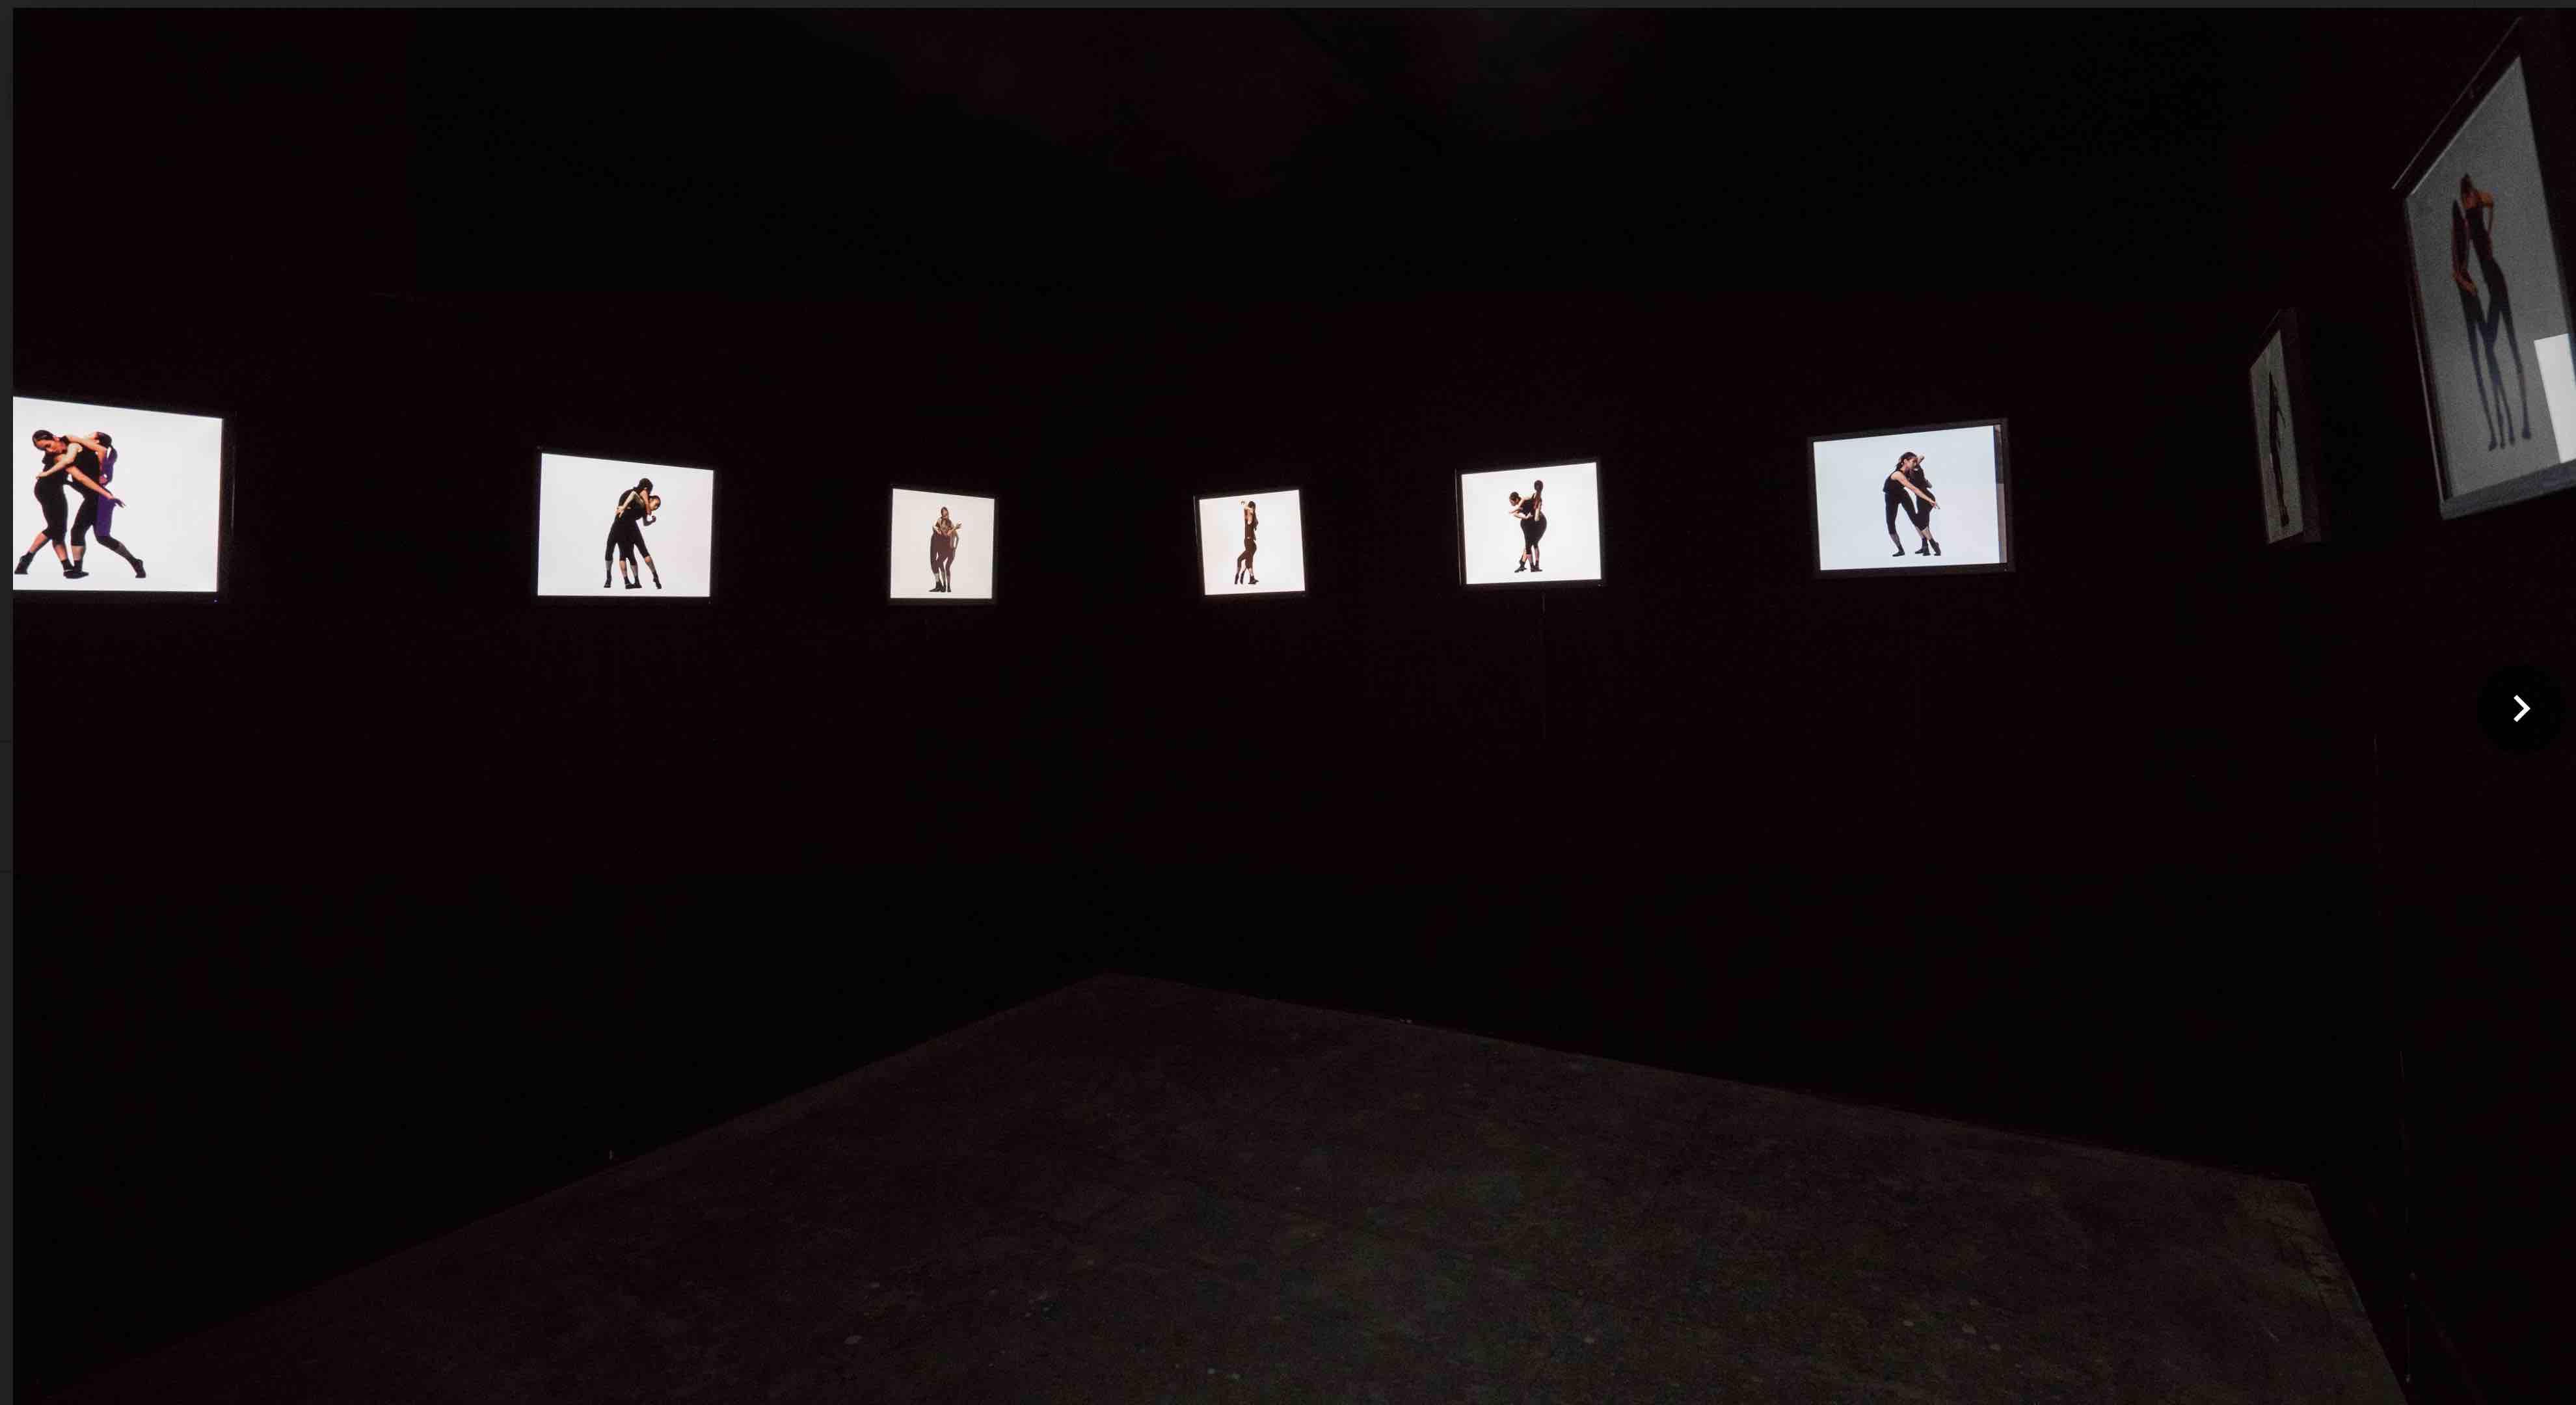 Image ti《自由步-聽身變位》,2017年,錄像裝置。(編舞:蘇威嘉;影像:張君懿;聲音:Yannick Dauby)tle